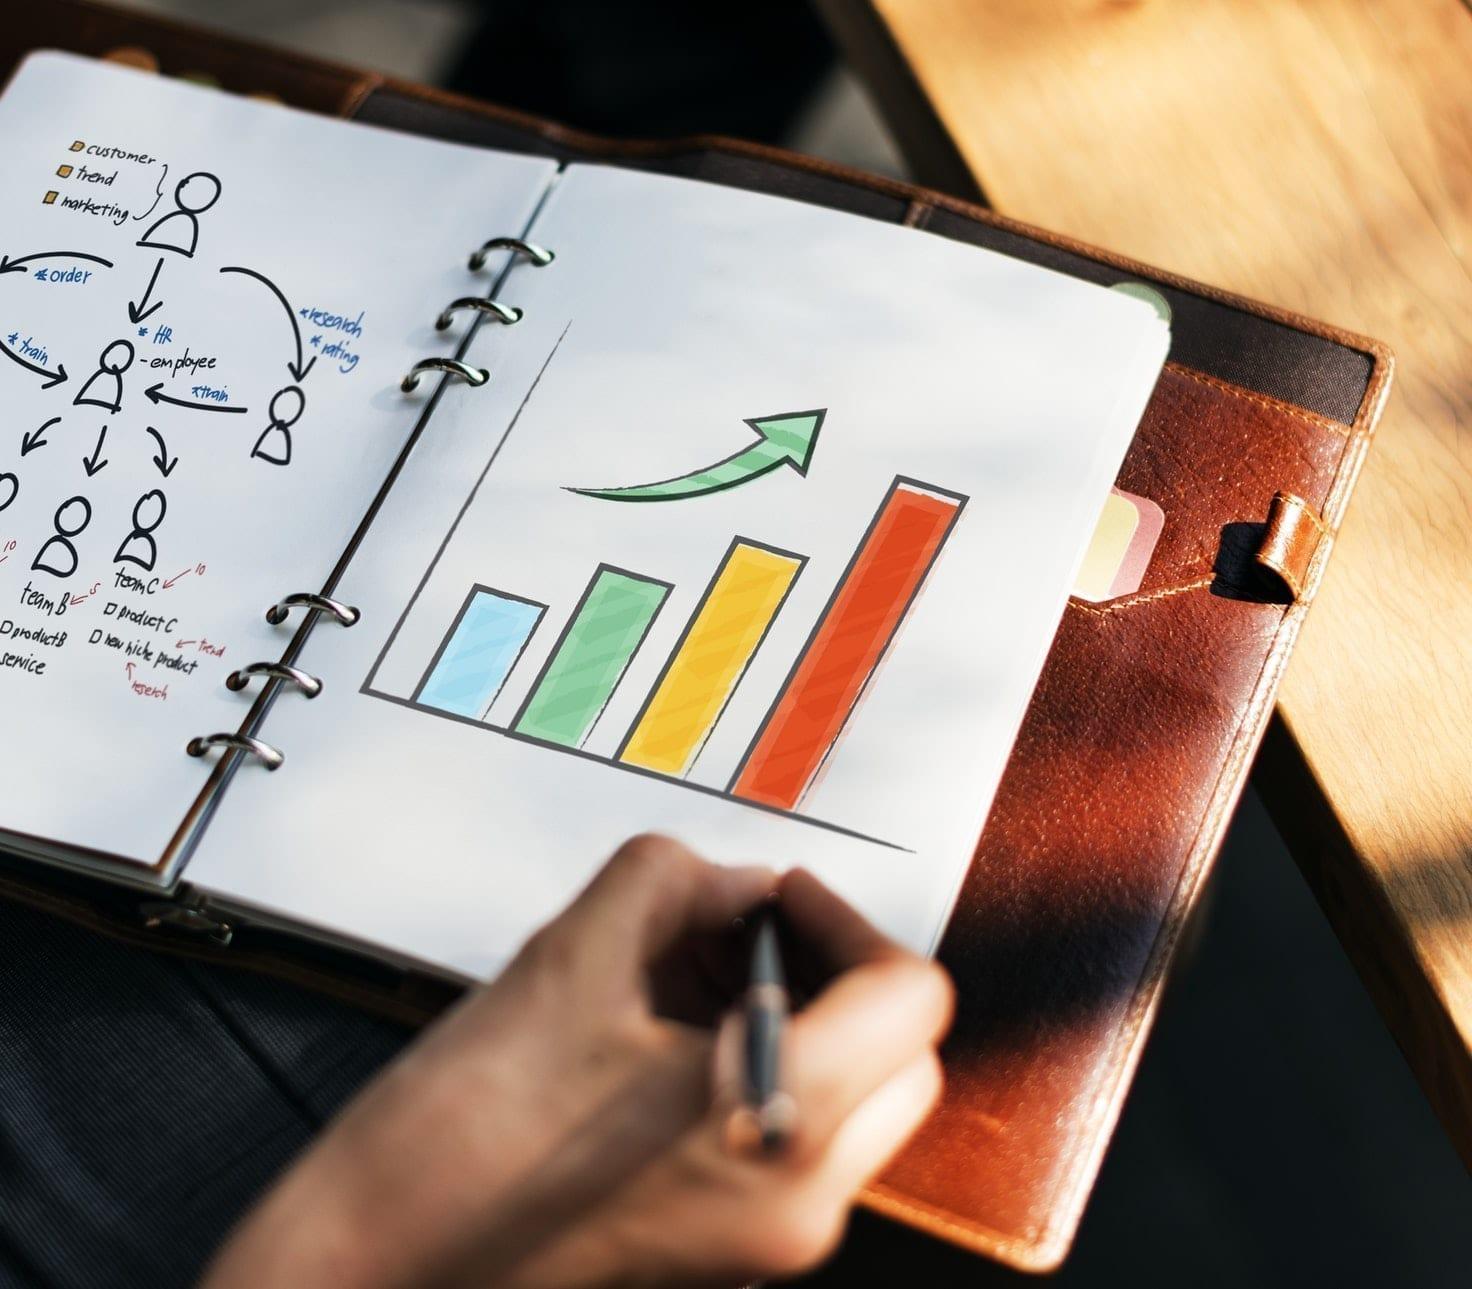 Colorful graph in padfolio